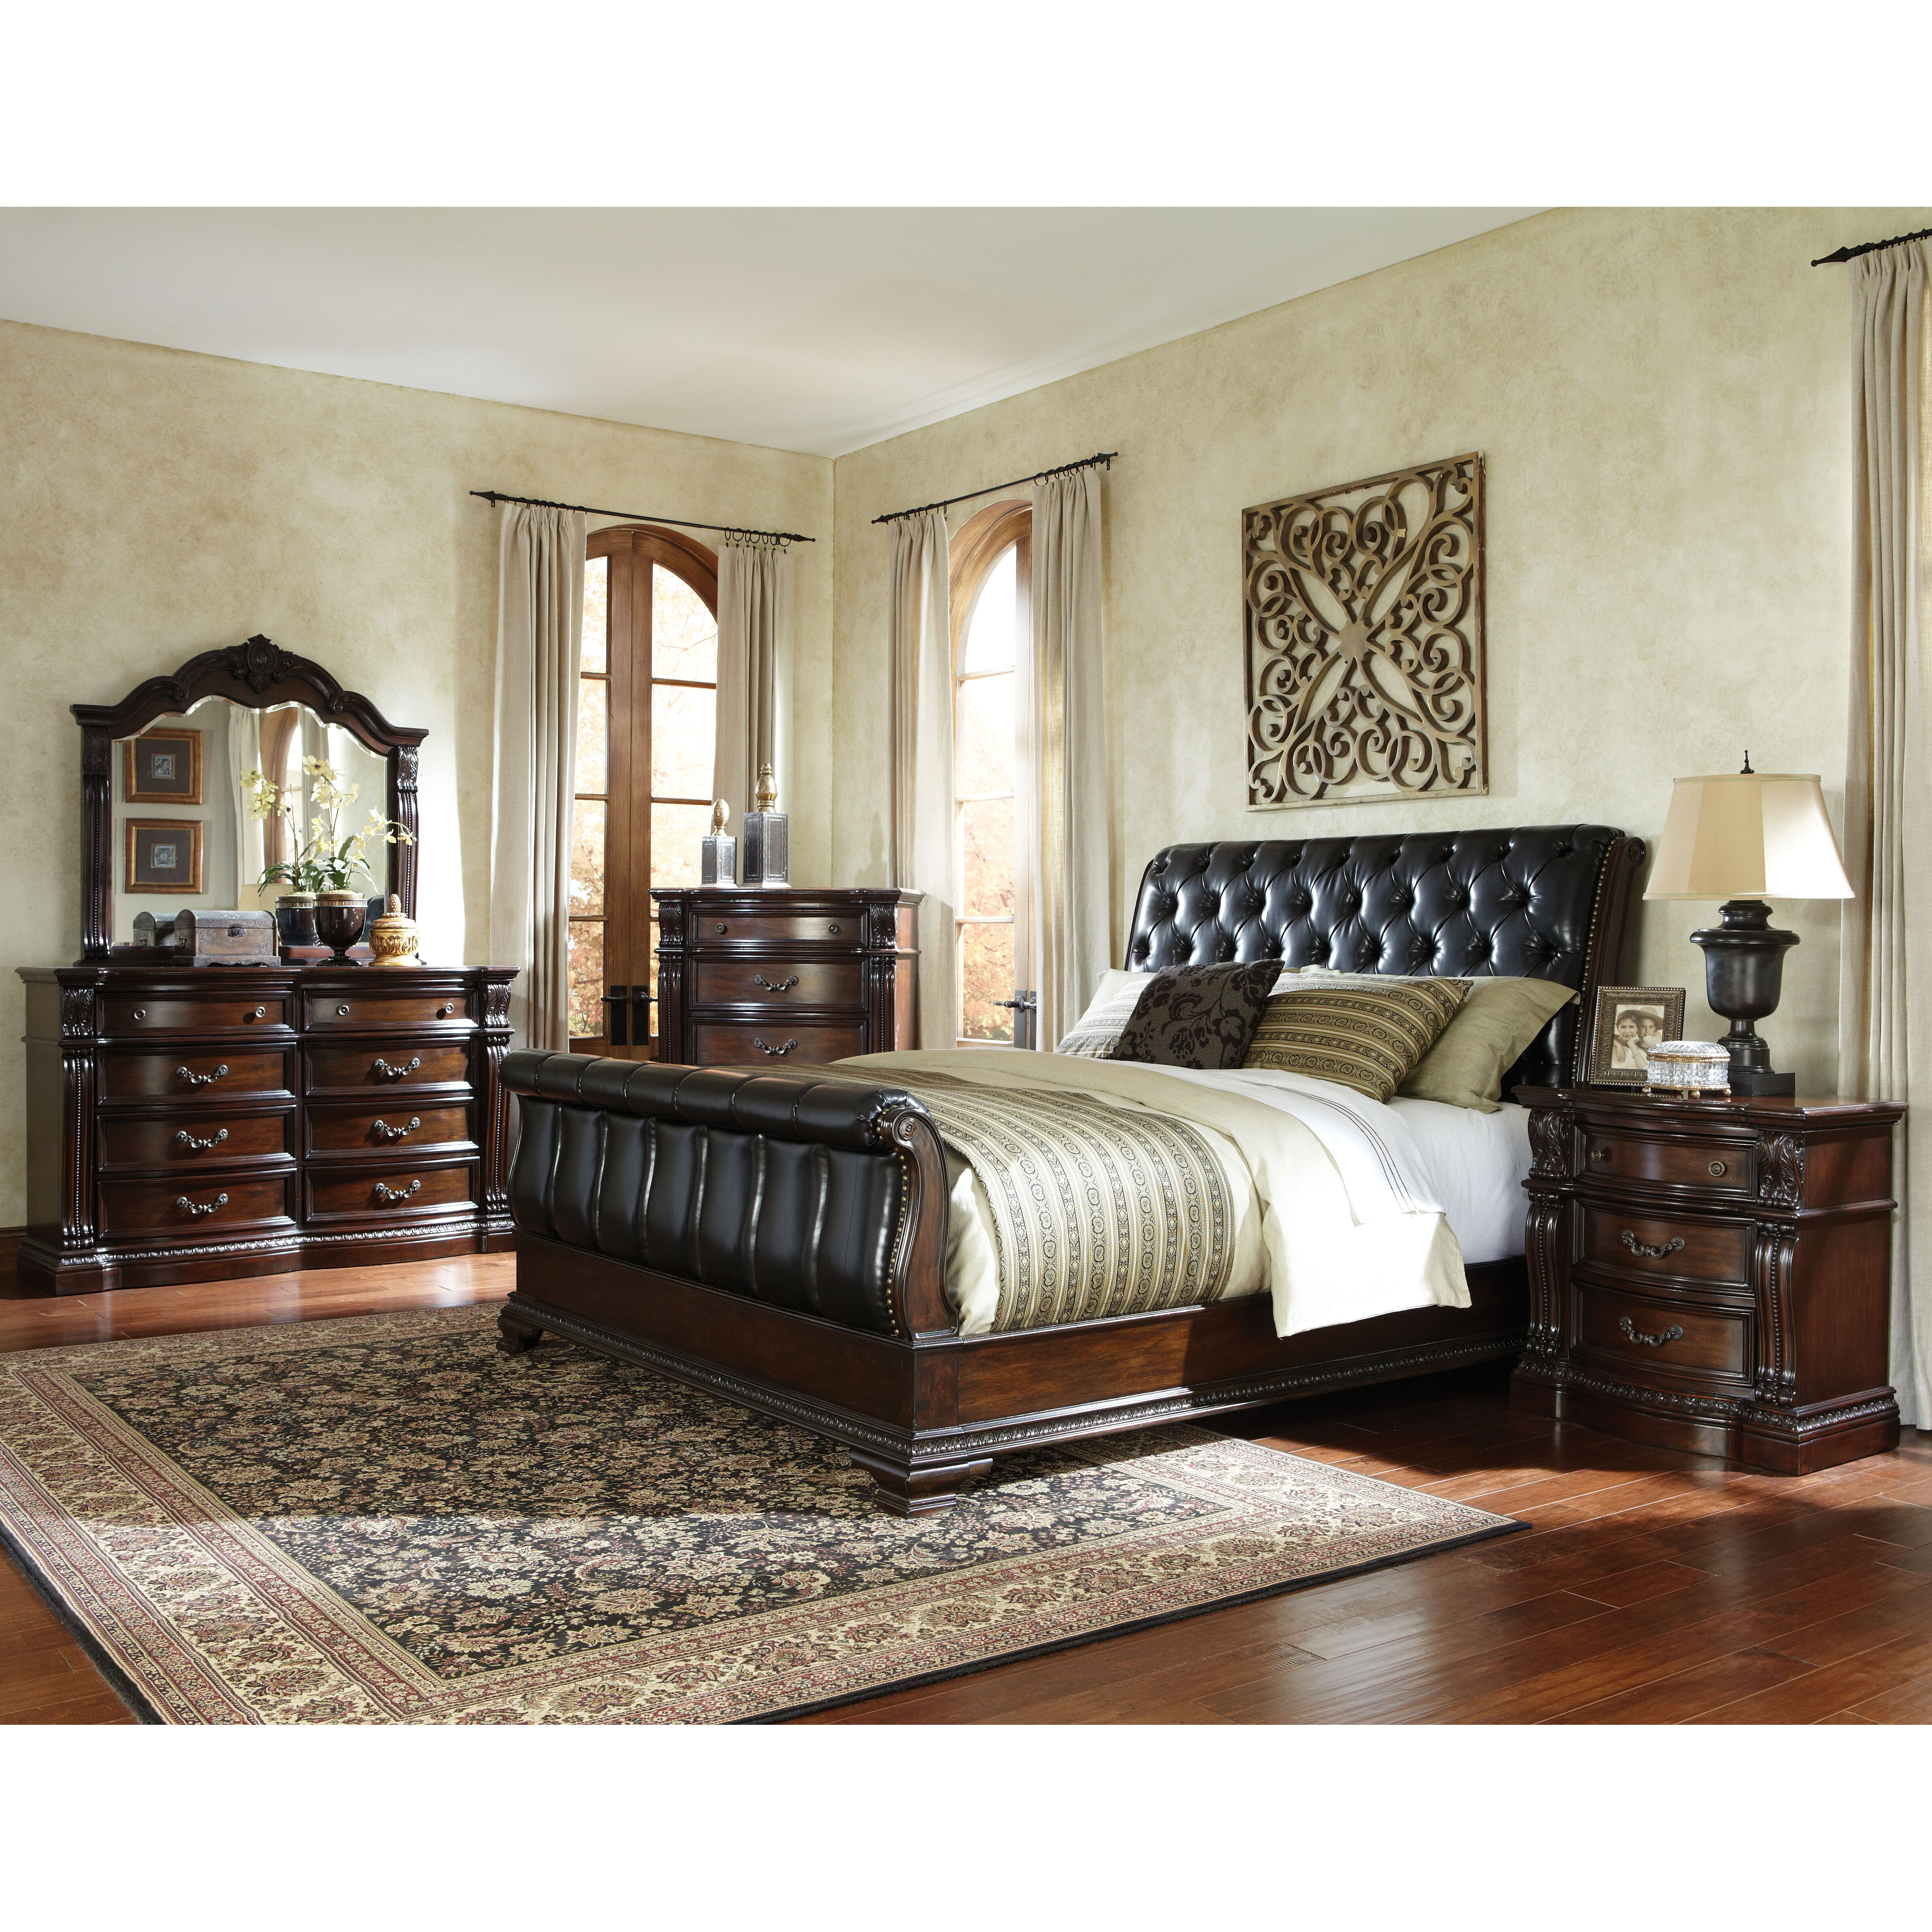 Sleigh Bed Bedroom Set Standard Furniture Churchill Upholstered Sleigh Bed Reviews